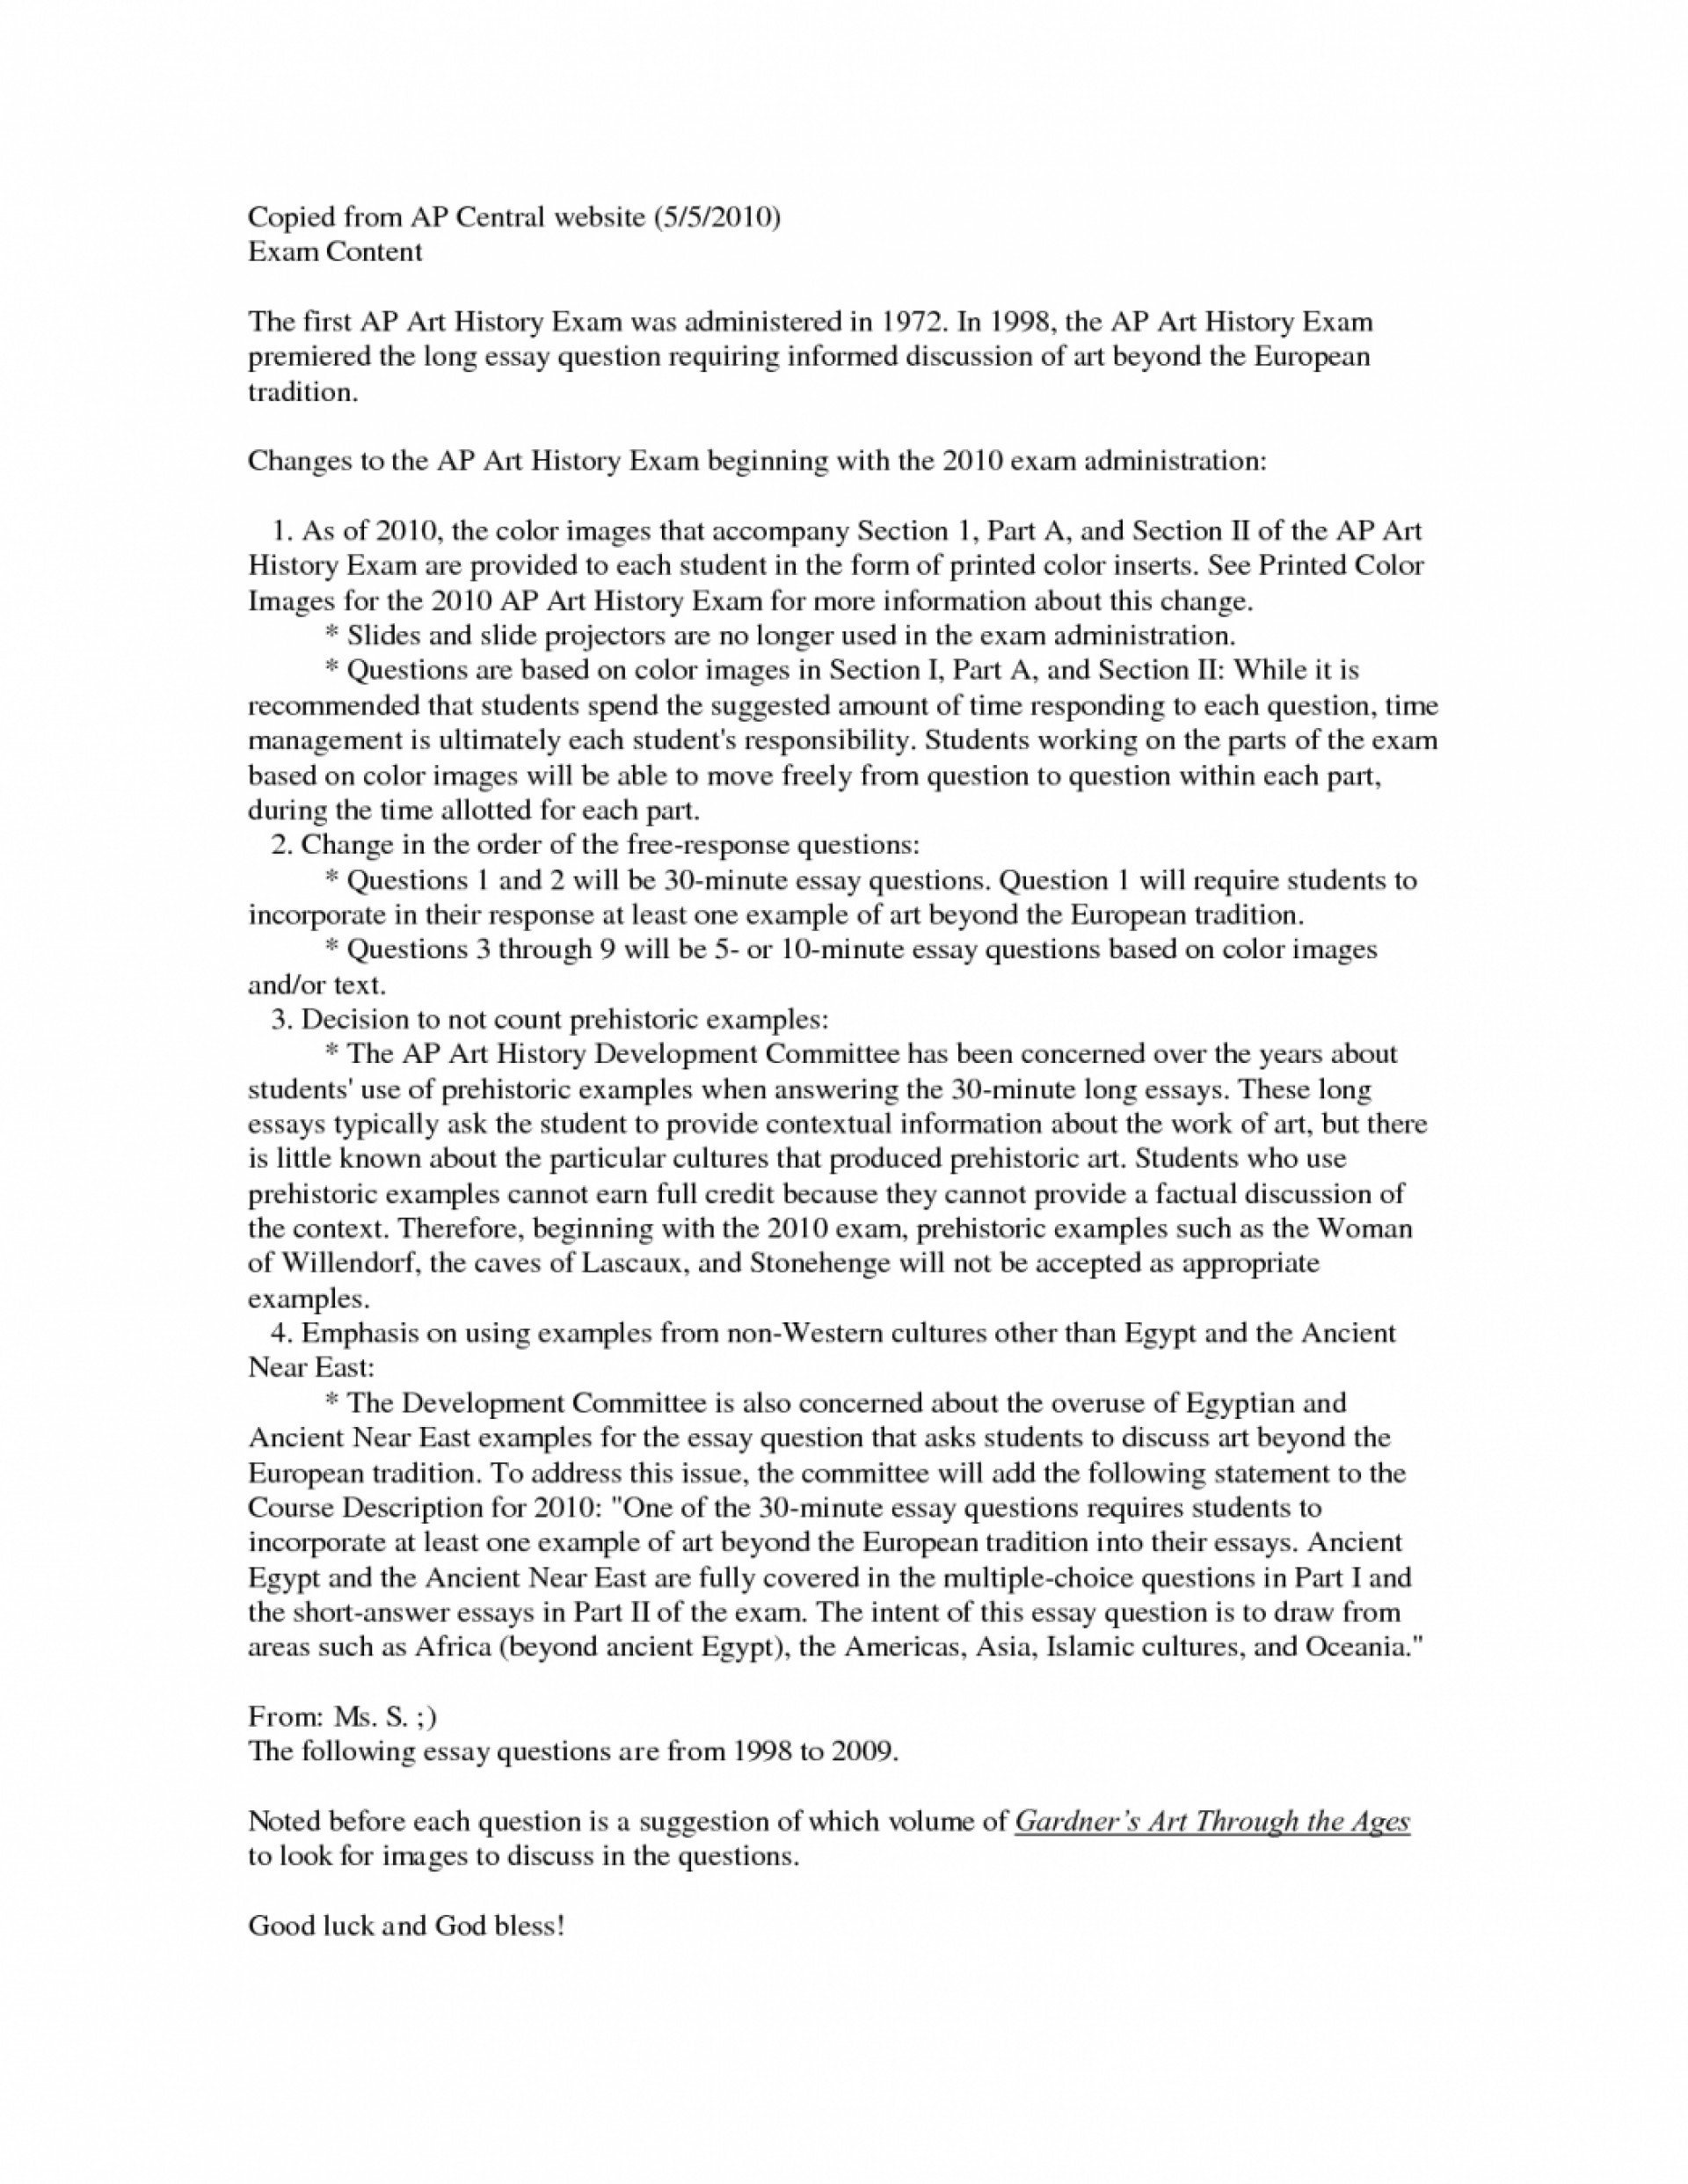 Dialogue interview essay